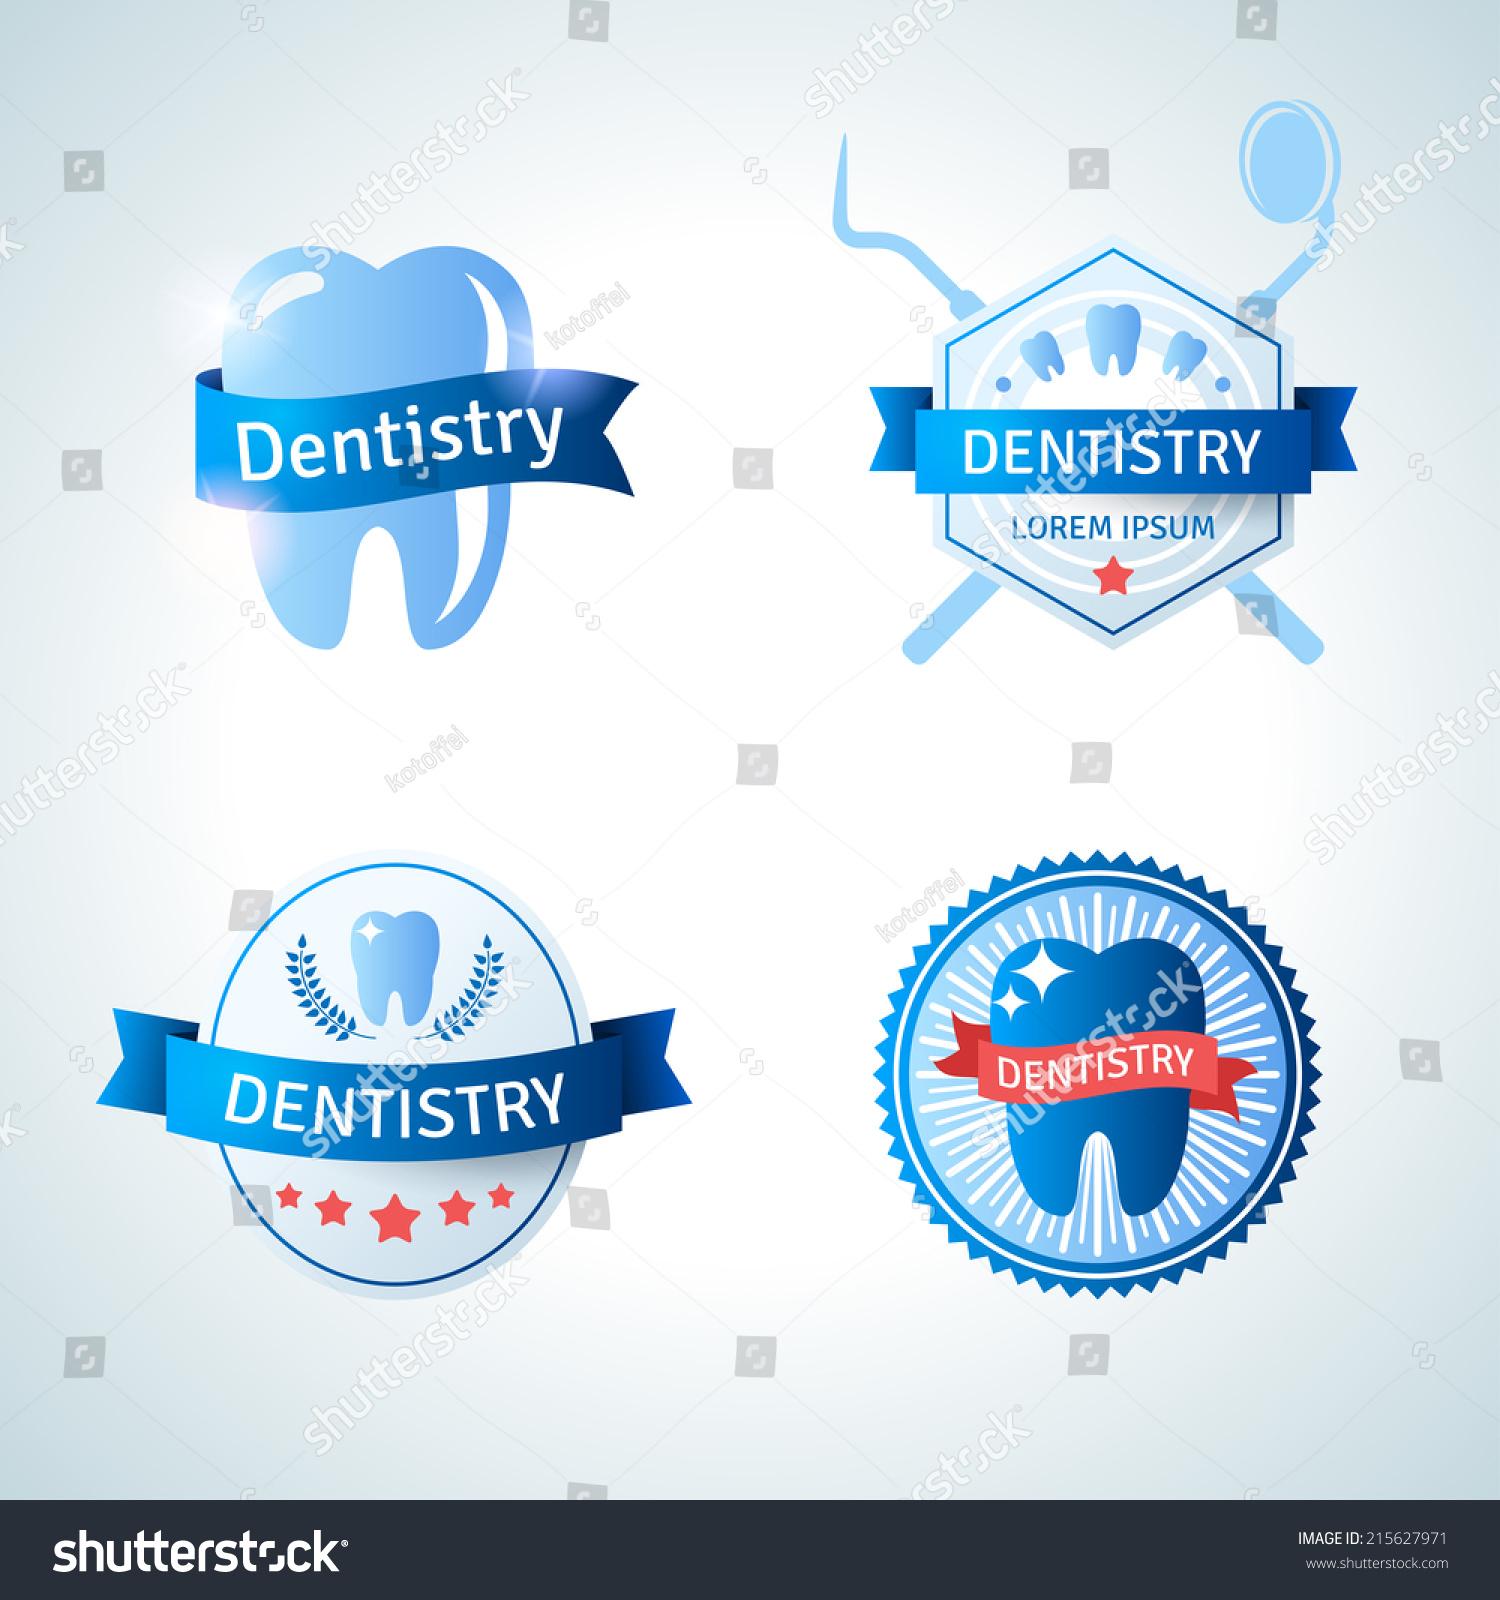 Dental Logos Collection Vector Illustration Vintage Stock Vector ...